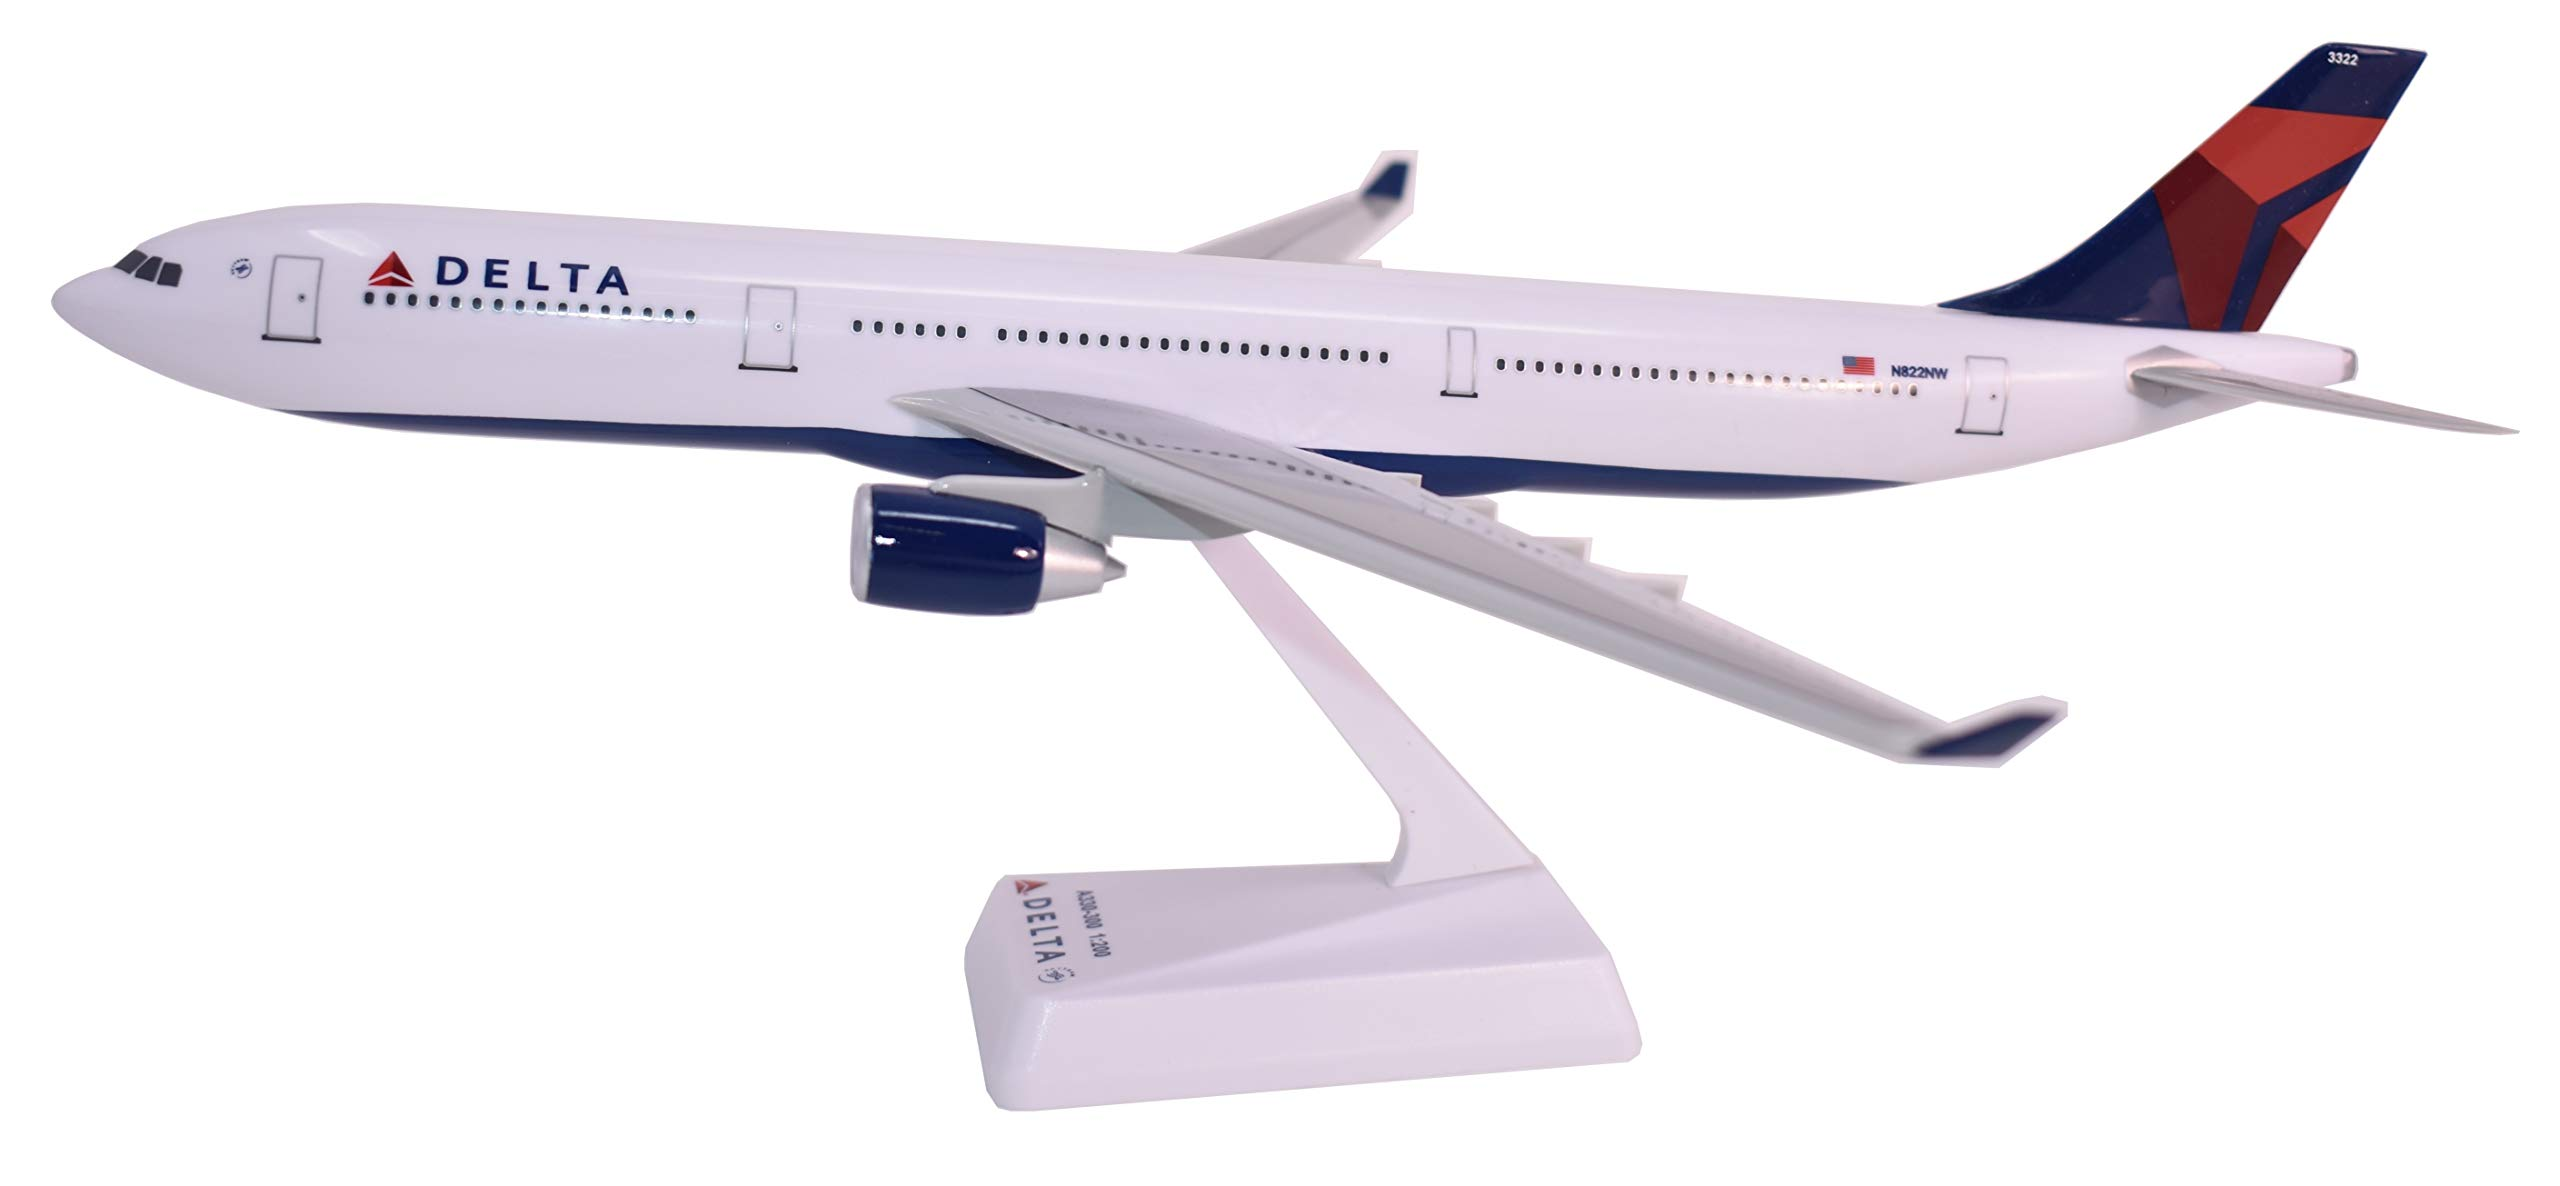 Flight Miniatures Delta (07-Cur) A330-300 Airplane Miniature Model Snap Fit 1:200 # AAB-33030H-011